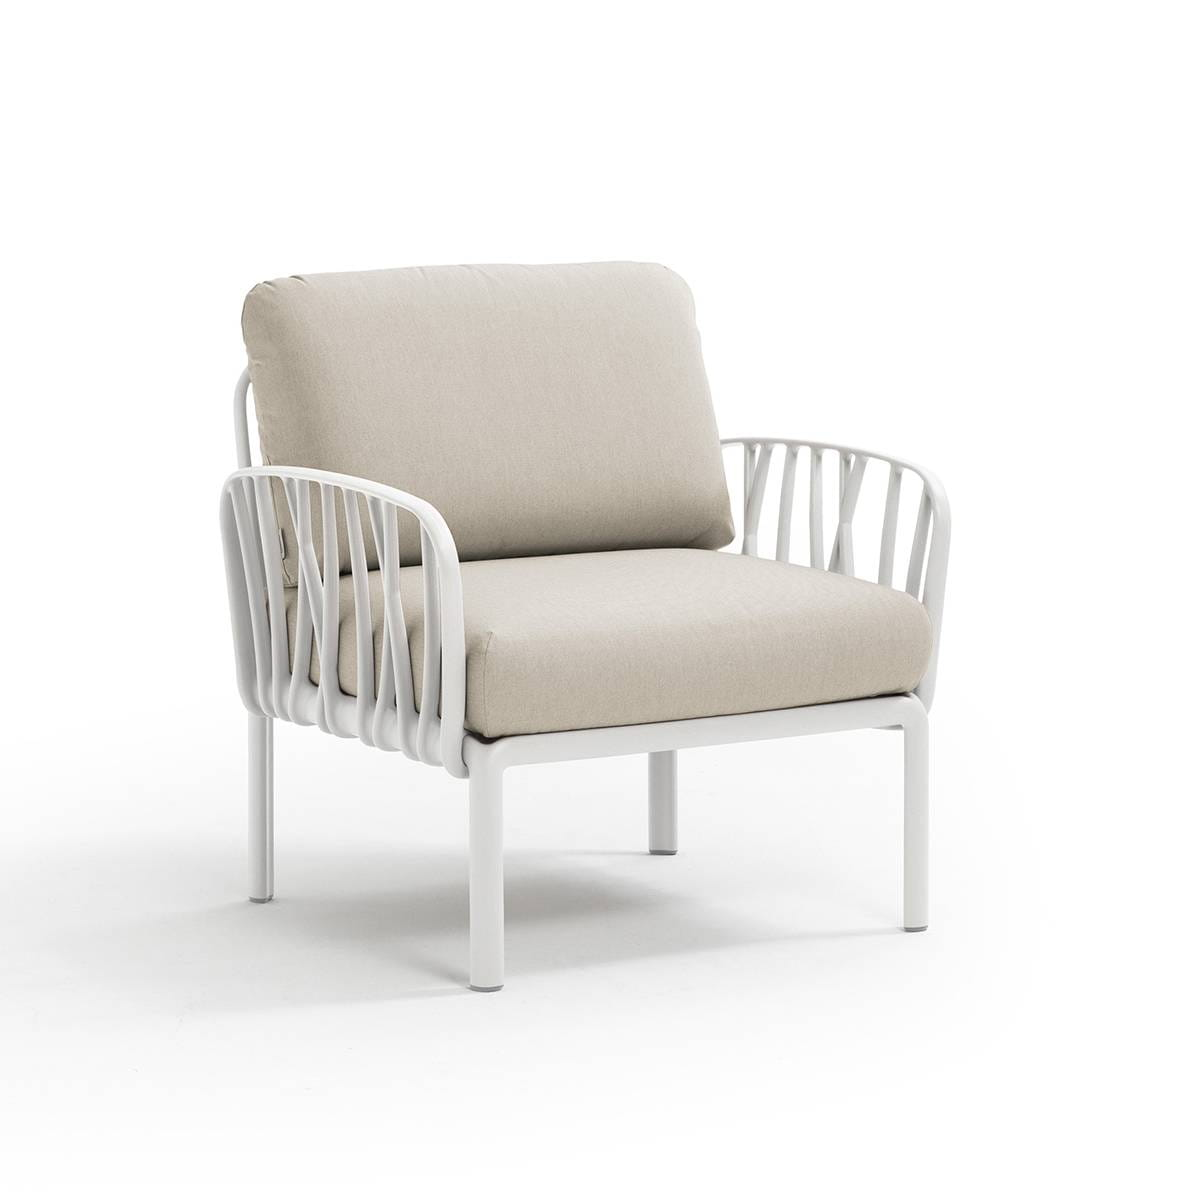 Nardi Sofa Komodo Poltrona Bianco-Panama